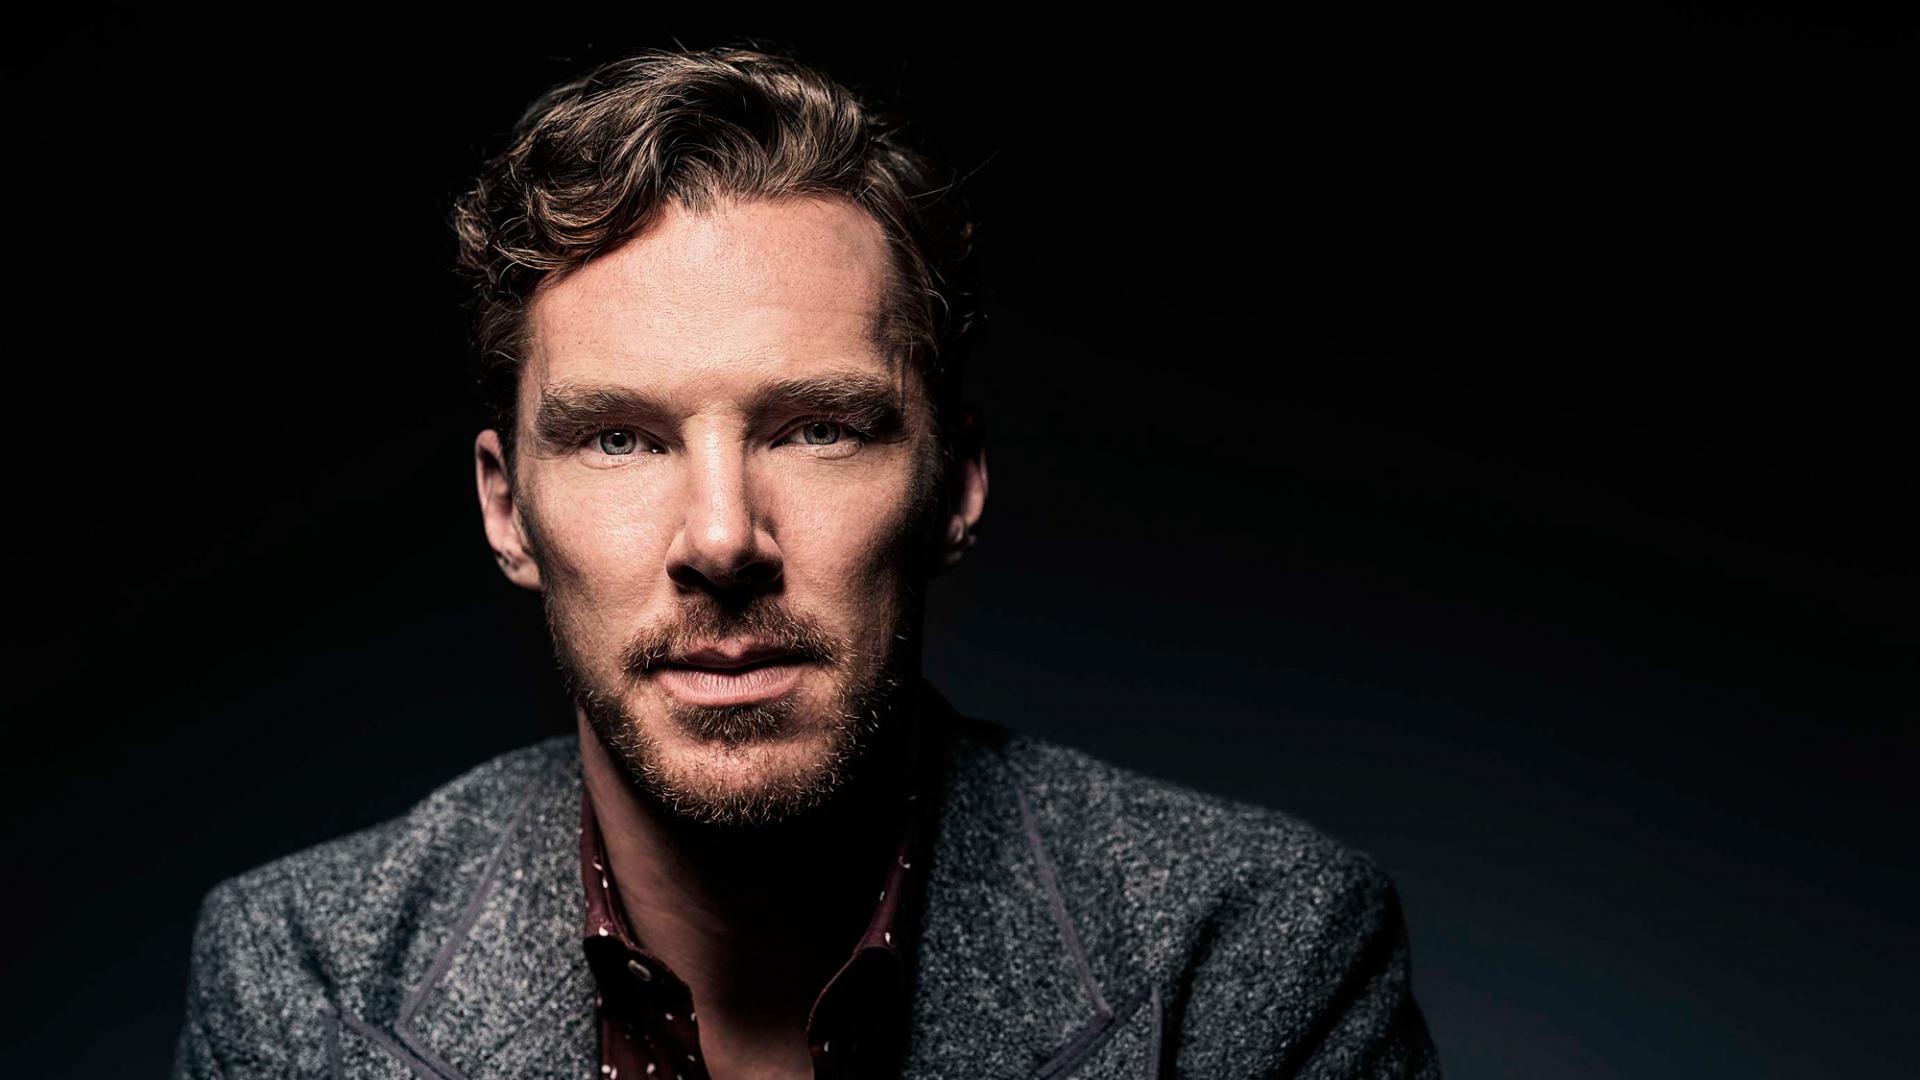 Benedict Cumberbatch Wallpaper For Laptop